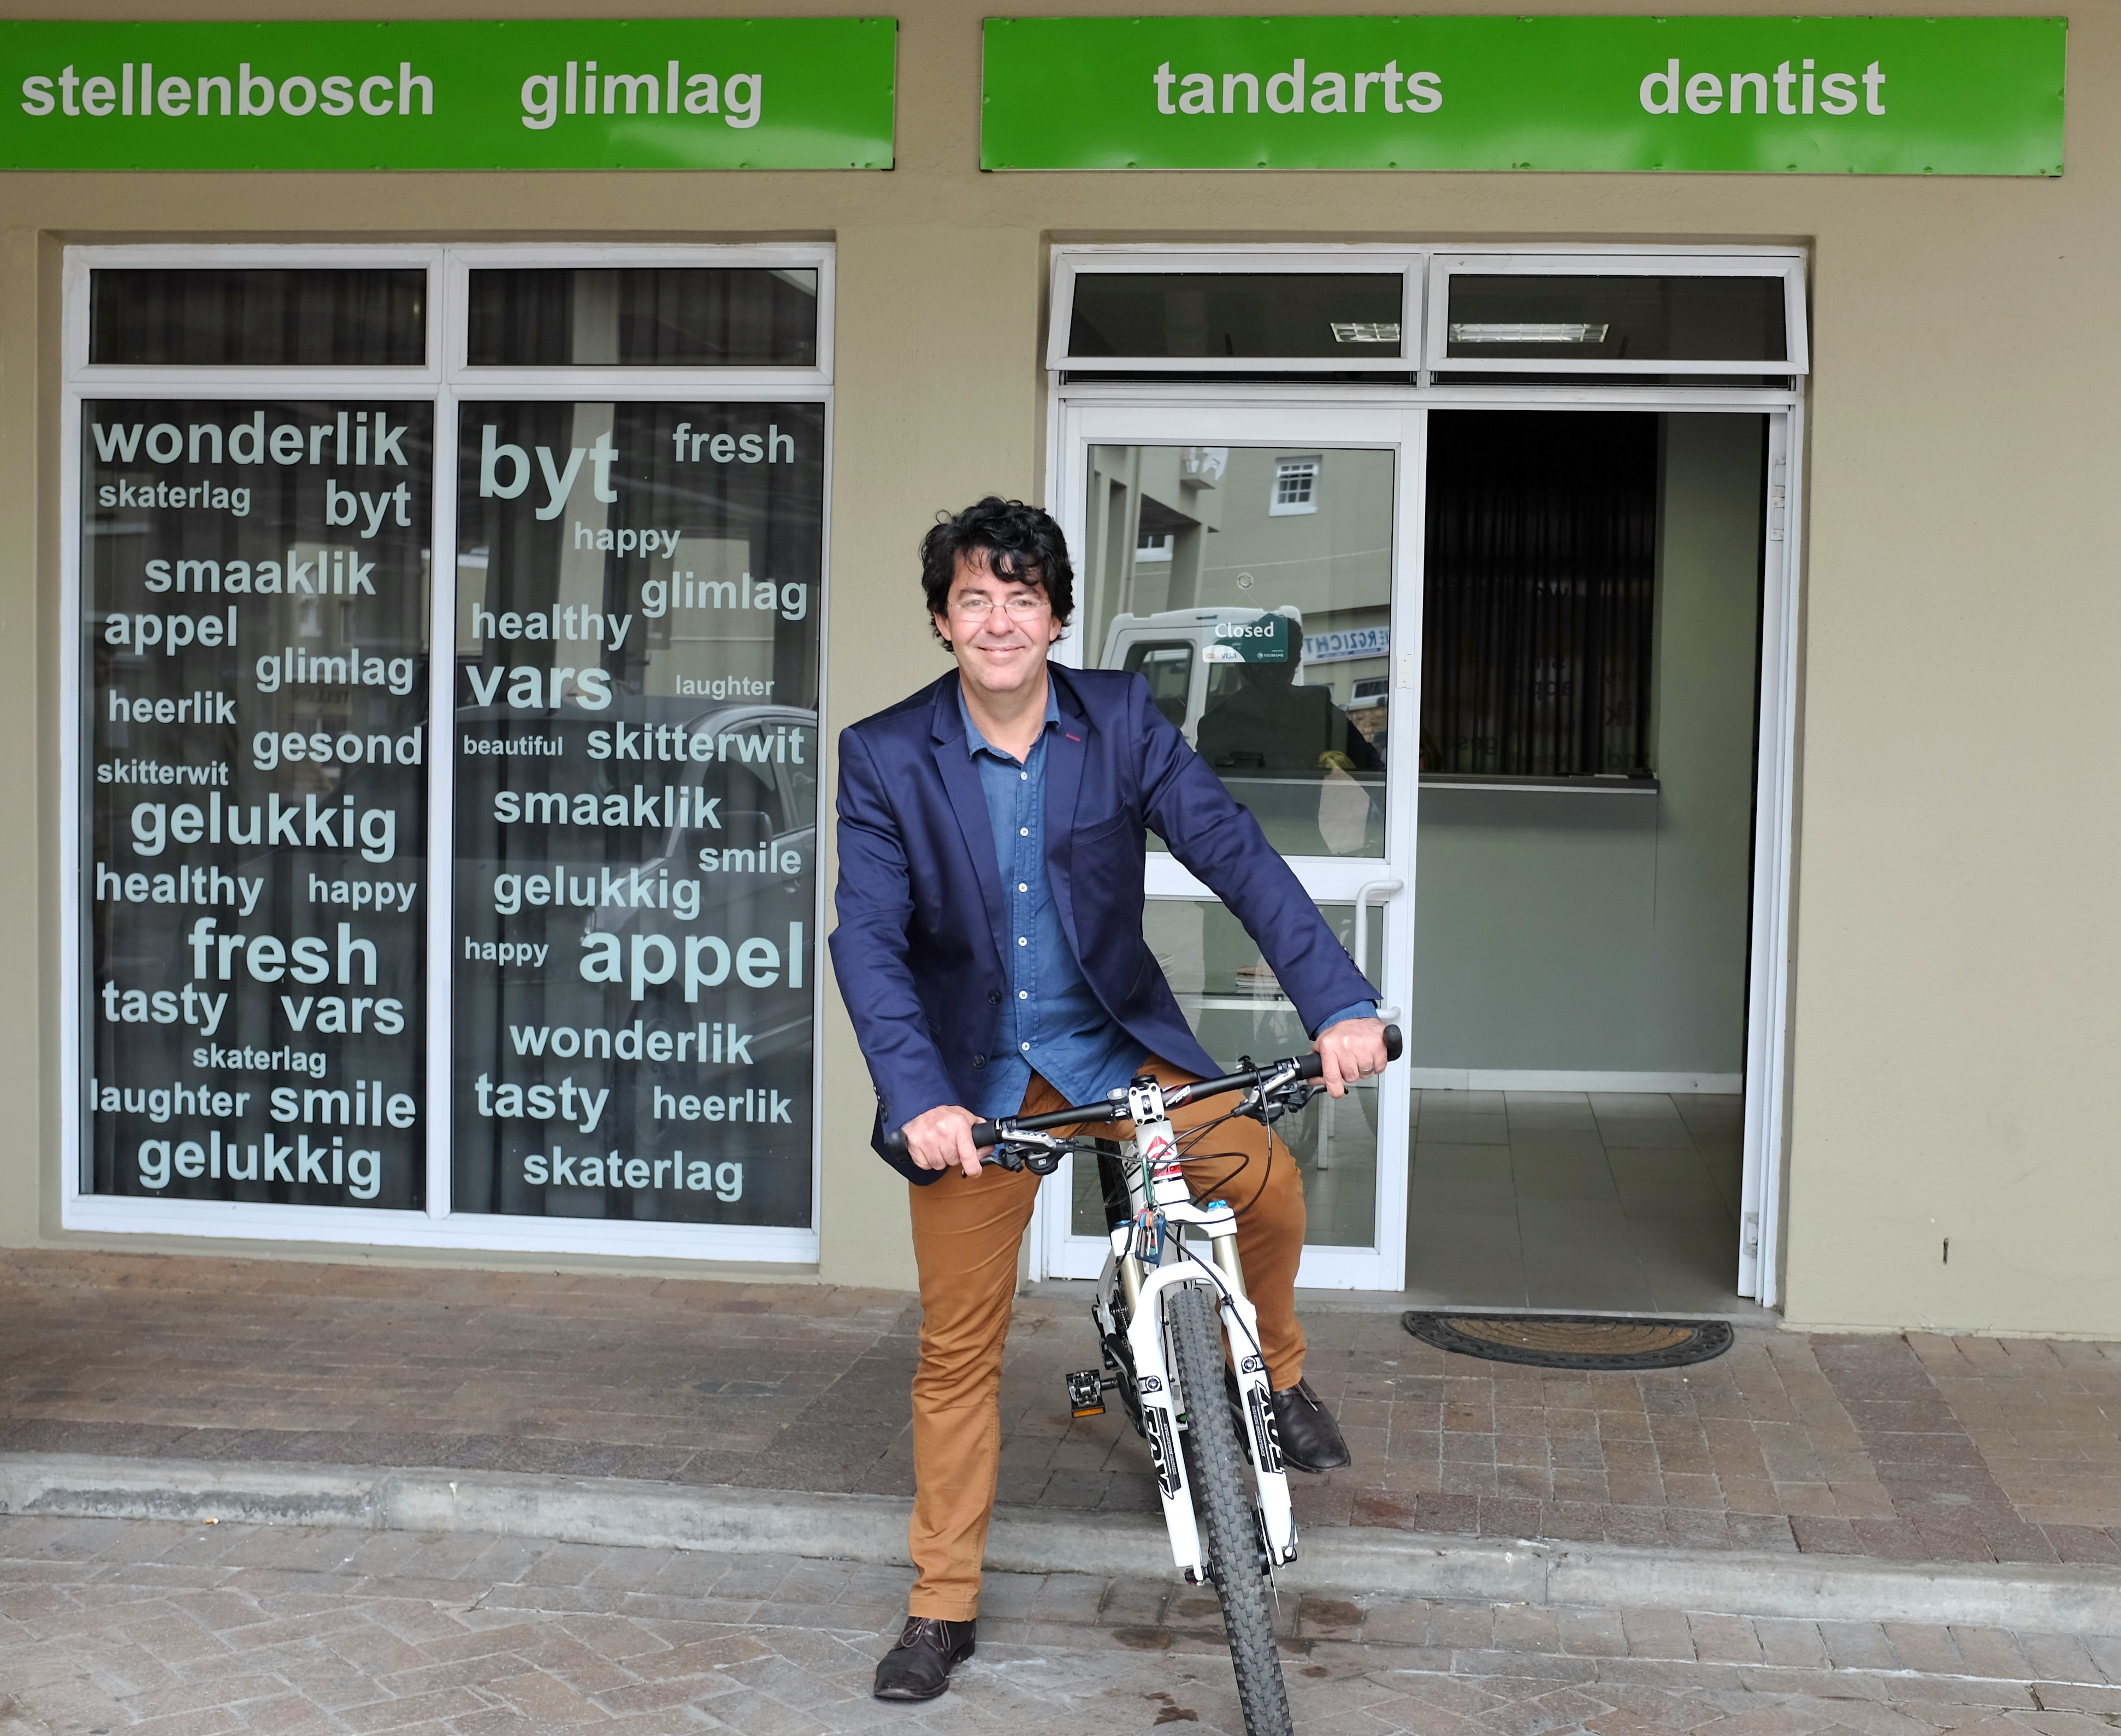 Fietsportret: Ivann Kirsten (tandarts)